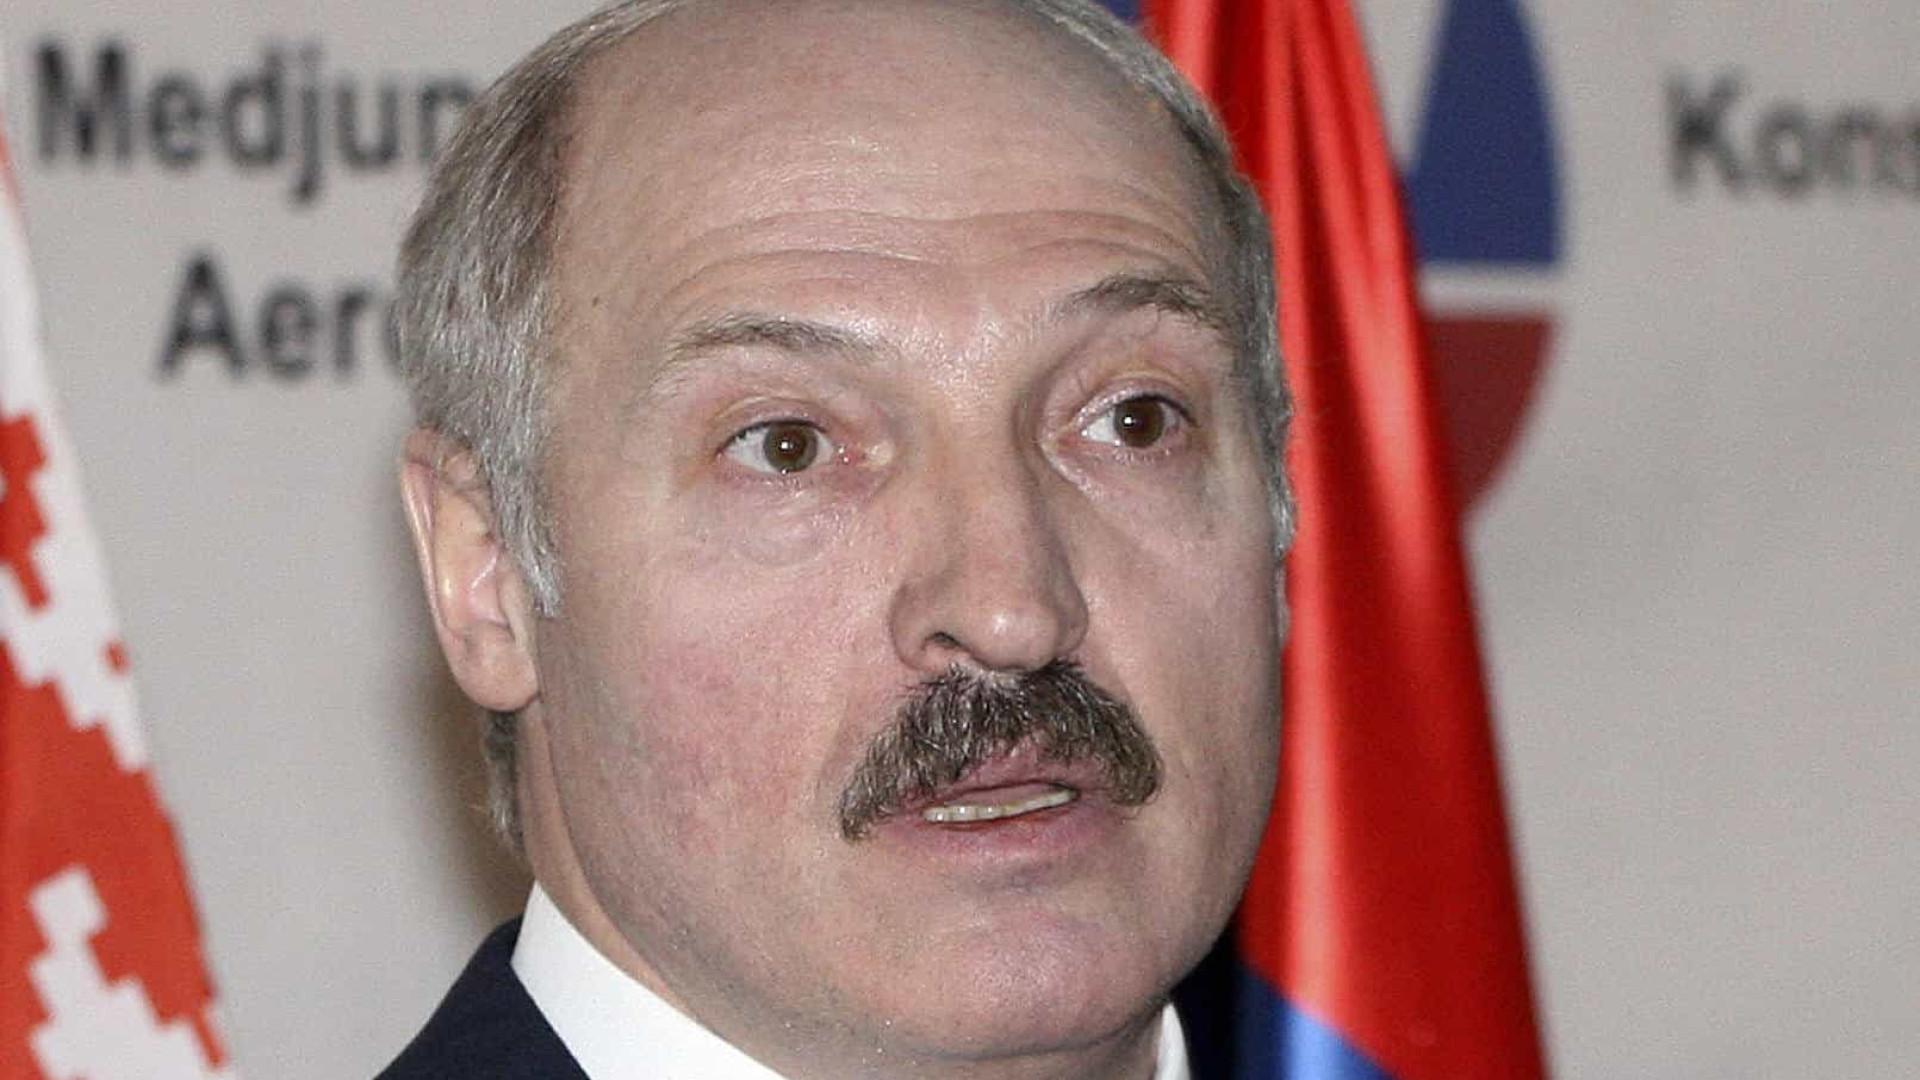 Lukachenko fecha principal site da Belarus e processa jornalistas